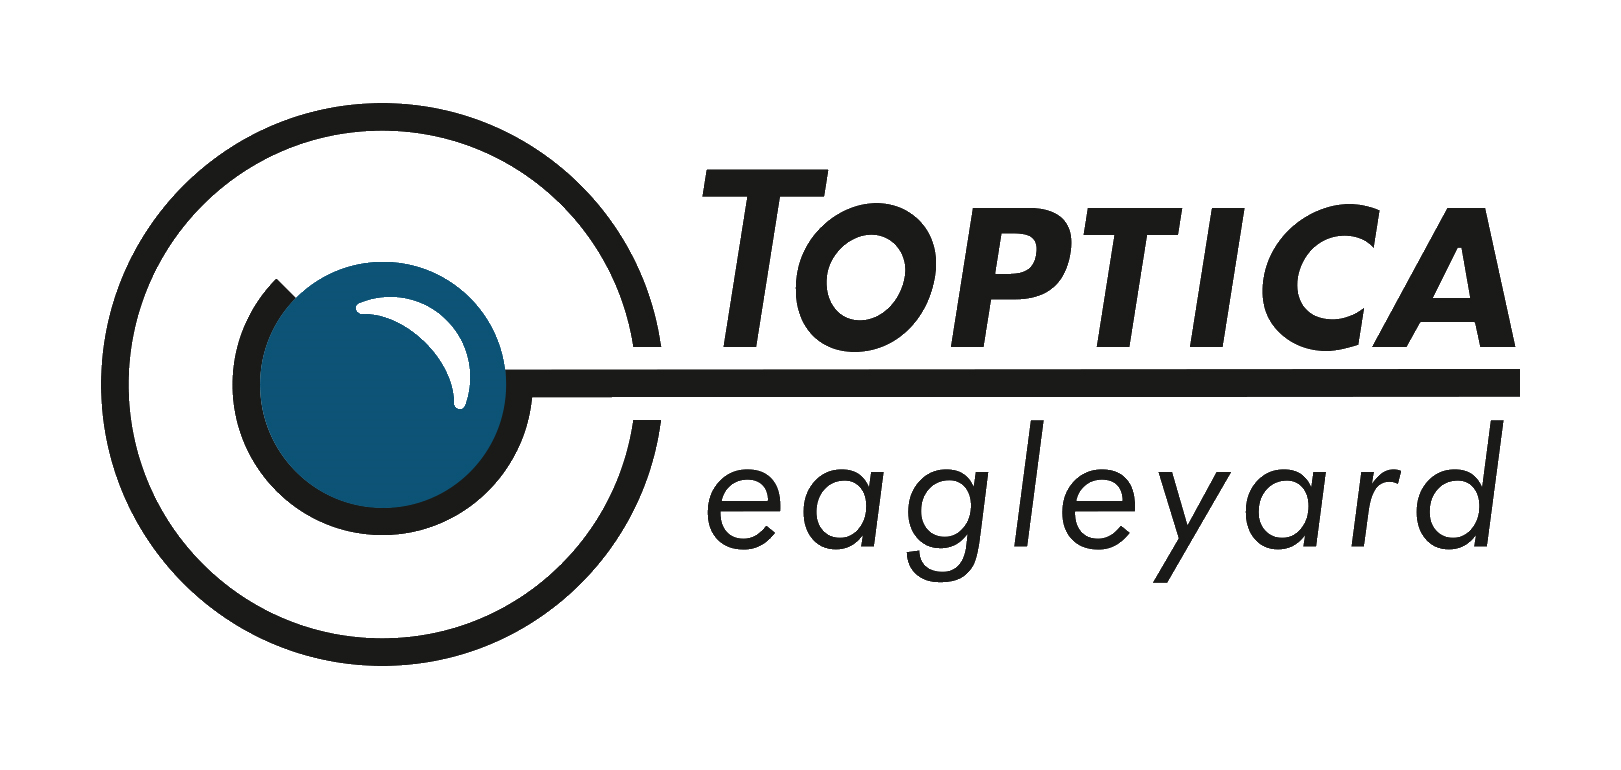 TOPTICA-eagleyard-logo-2colors-black_trans